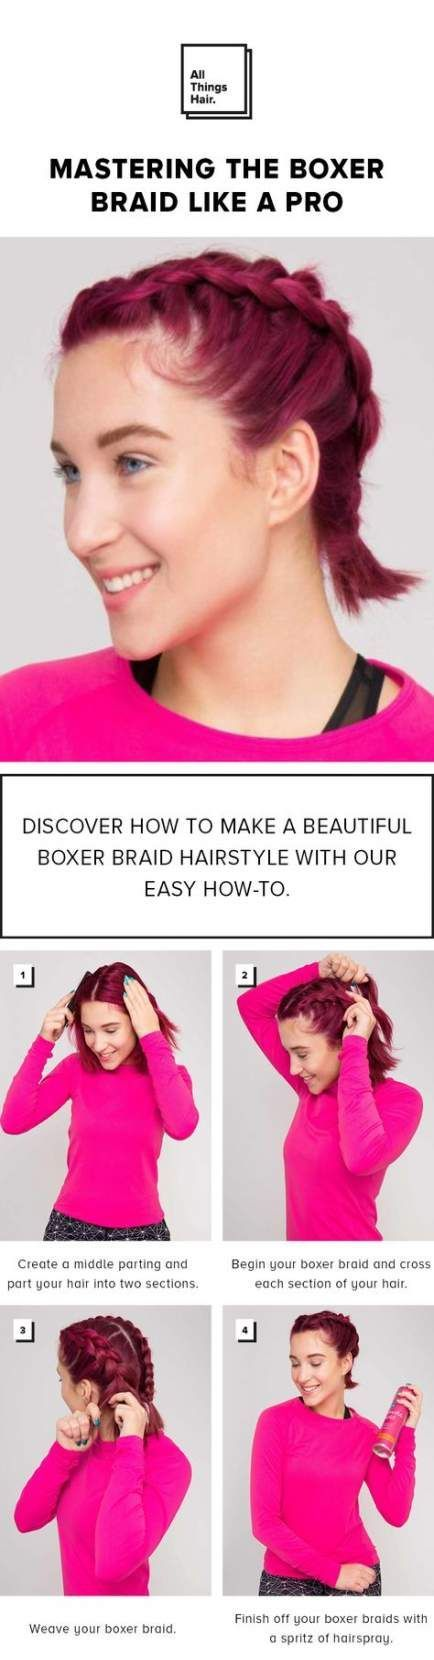 Zöpfe Tutorial Easy Boxer 32 Ideen, #Boxer #Easy #Ideen #Tutorial #Zöpfe